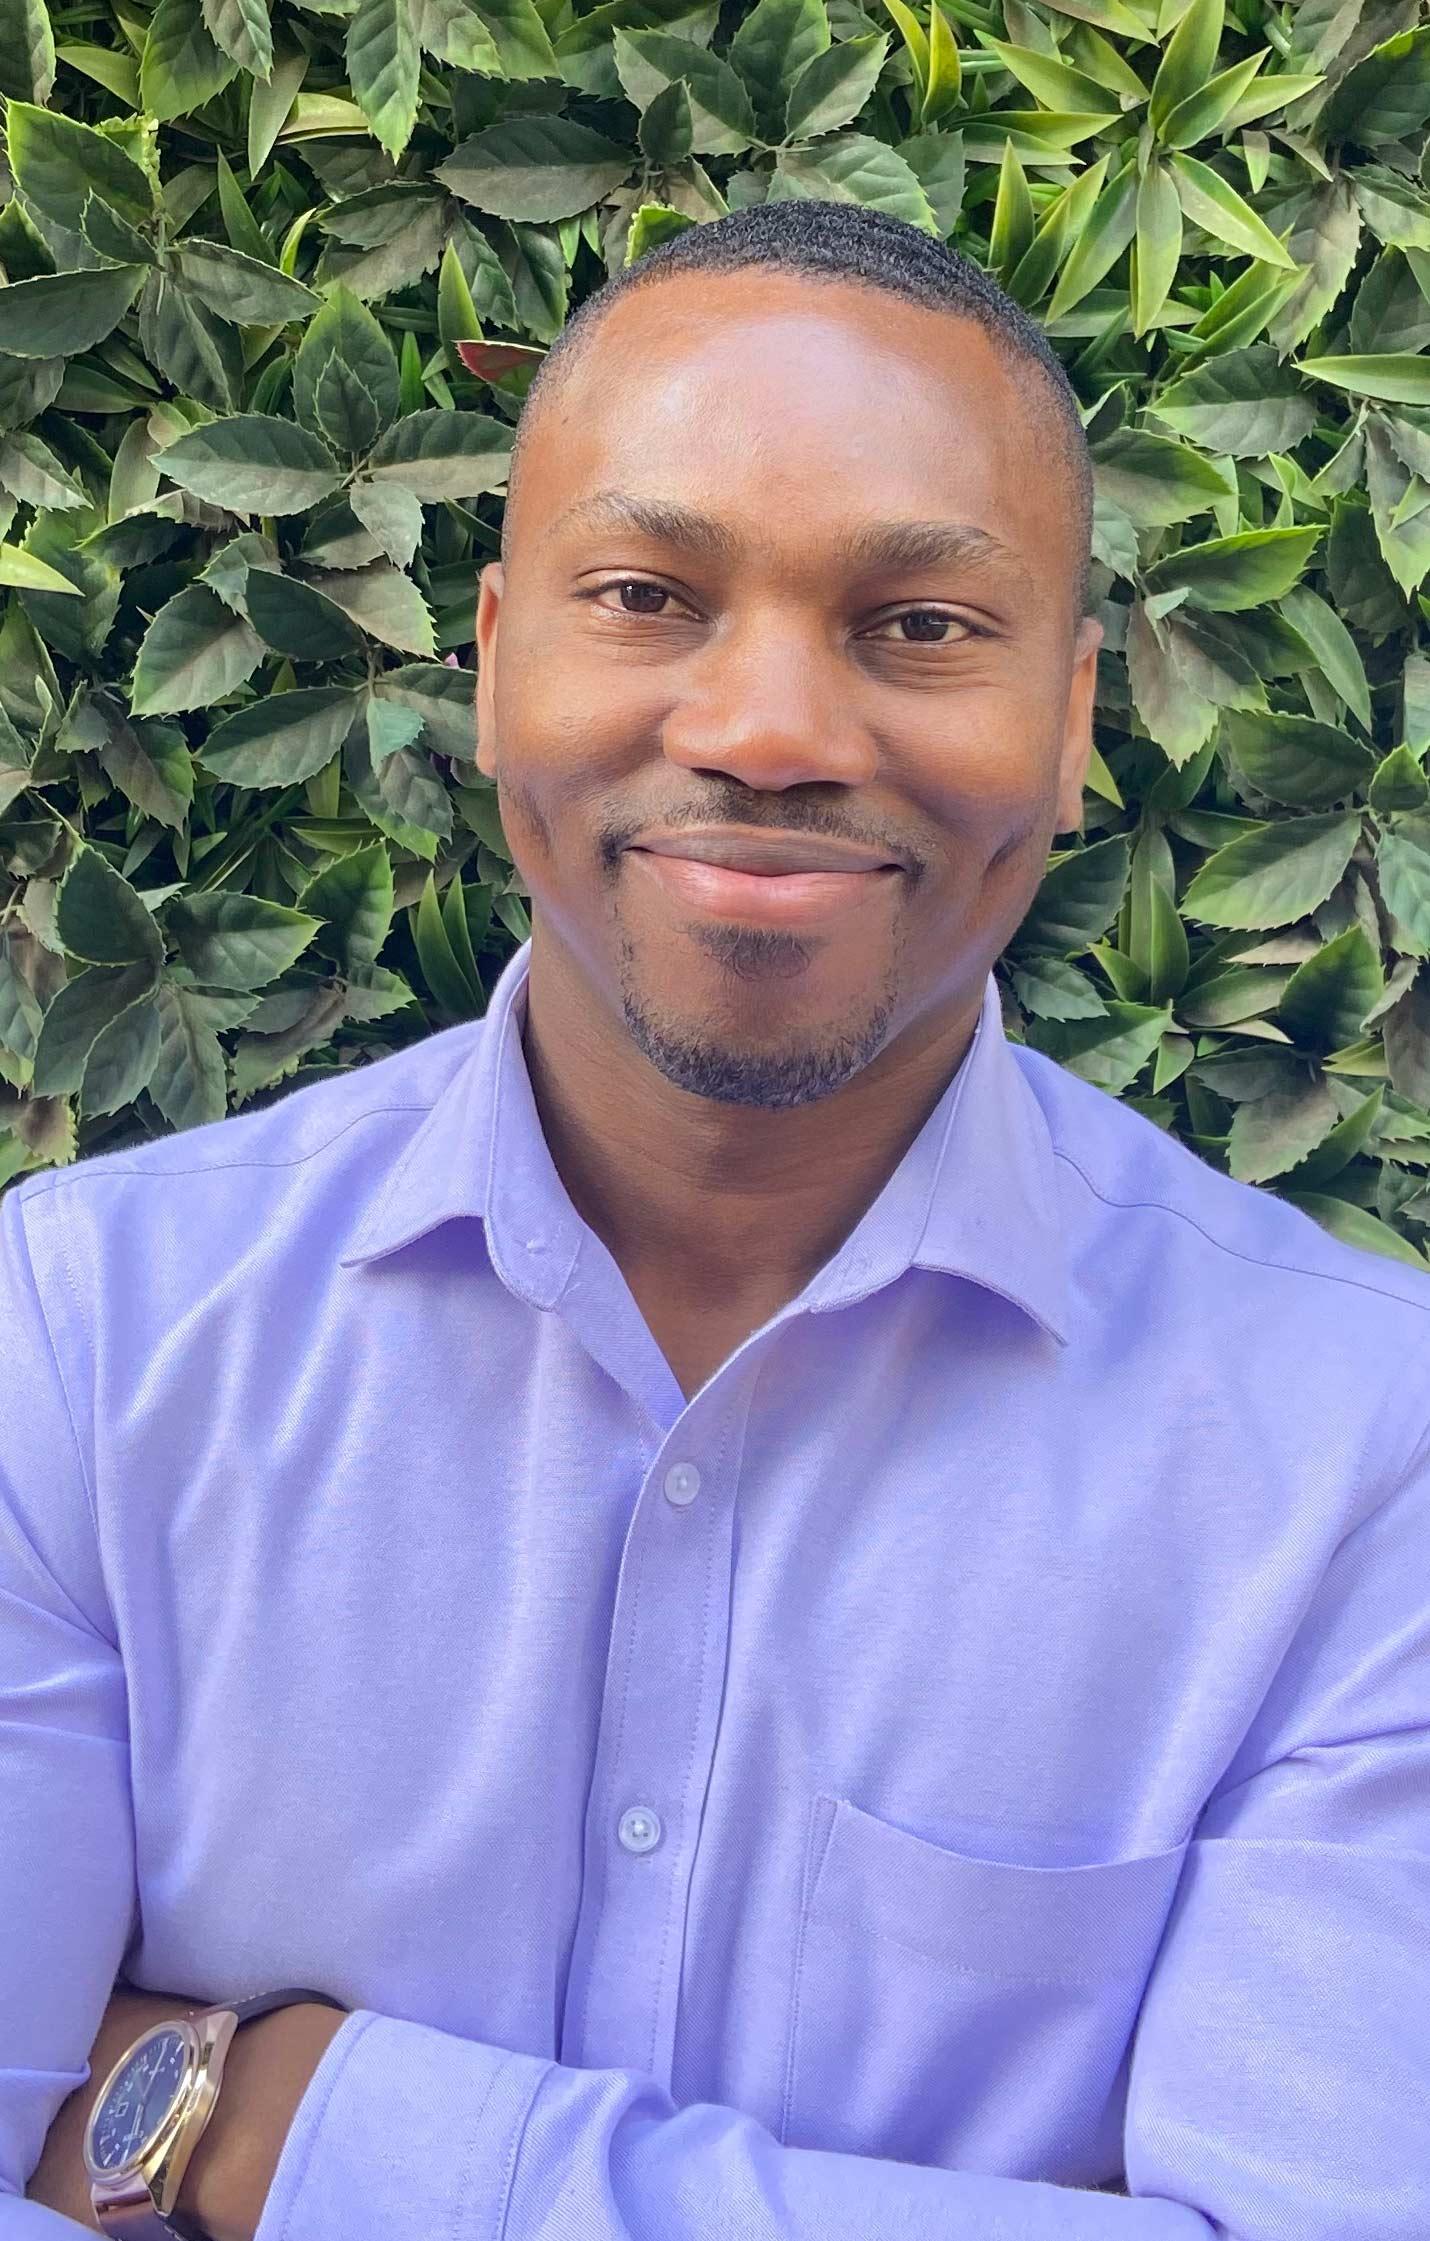 Image of Derrick Sowa